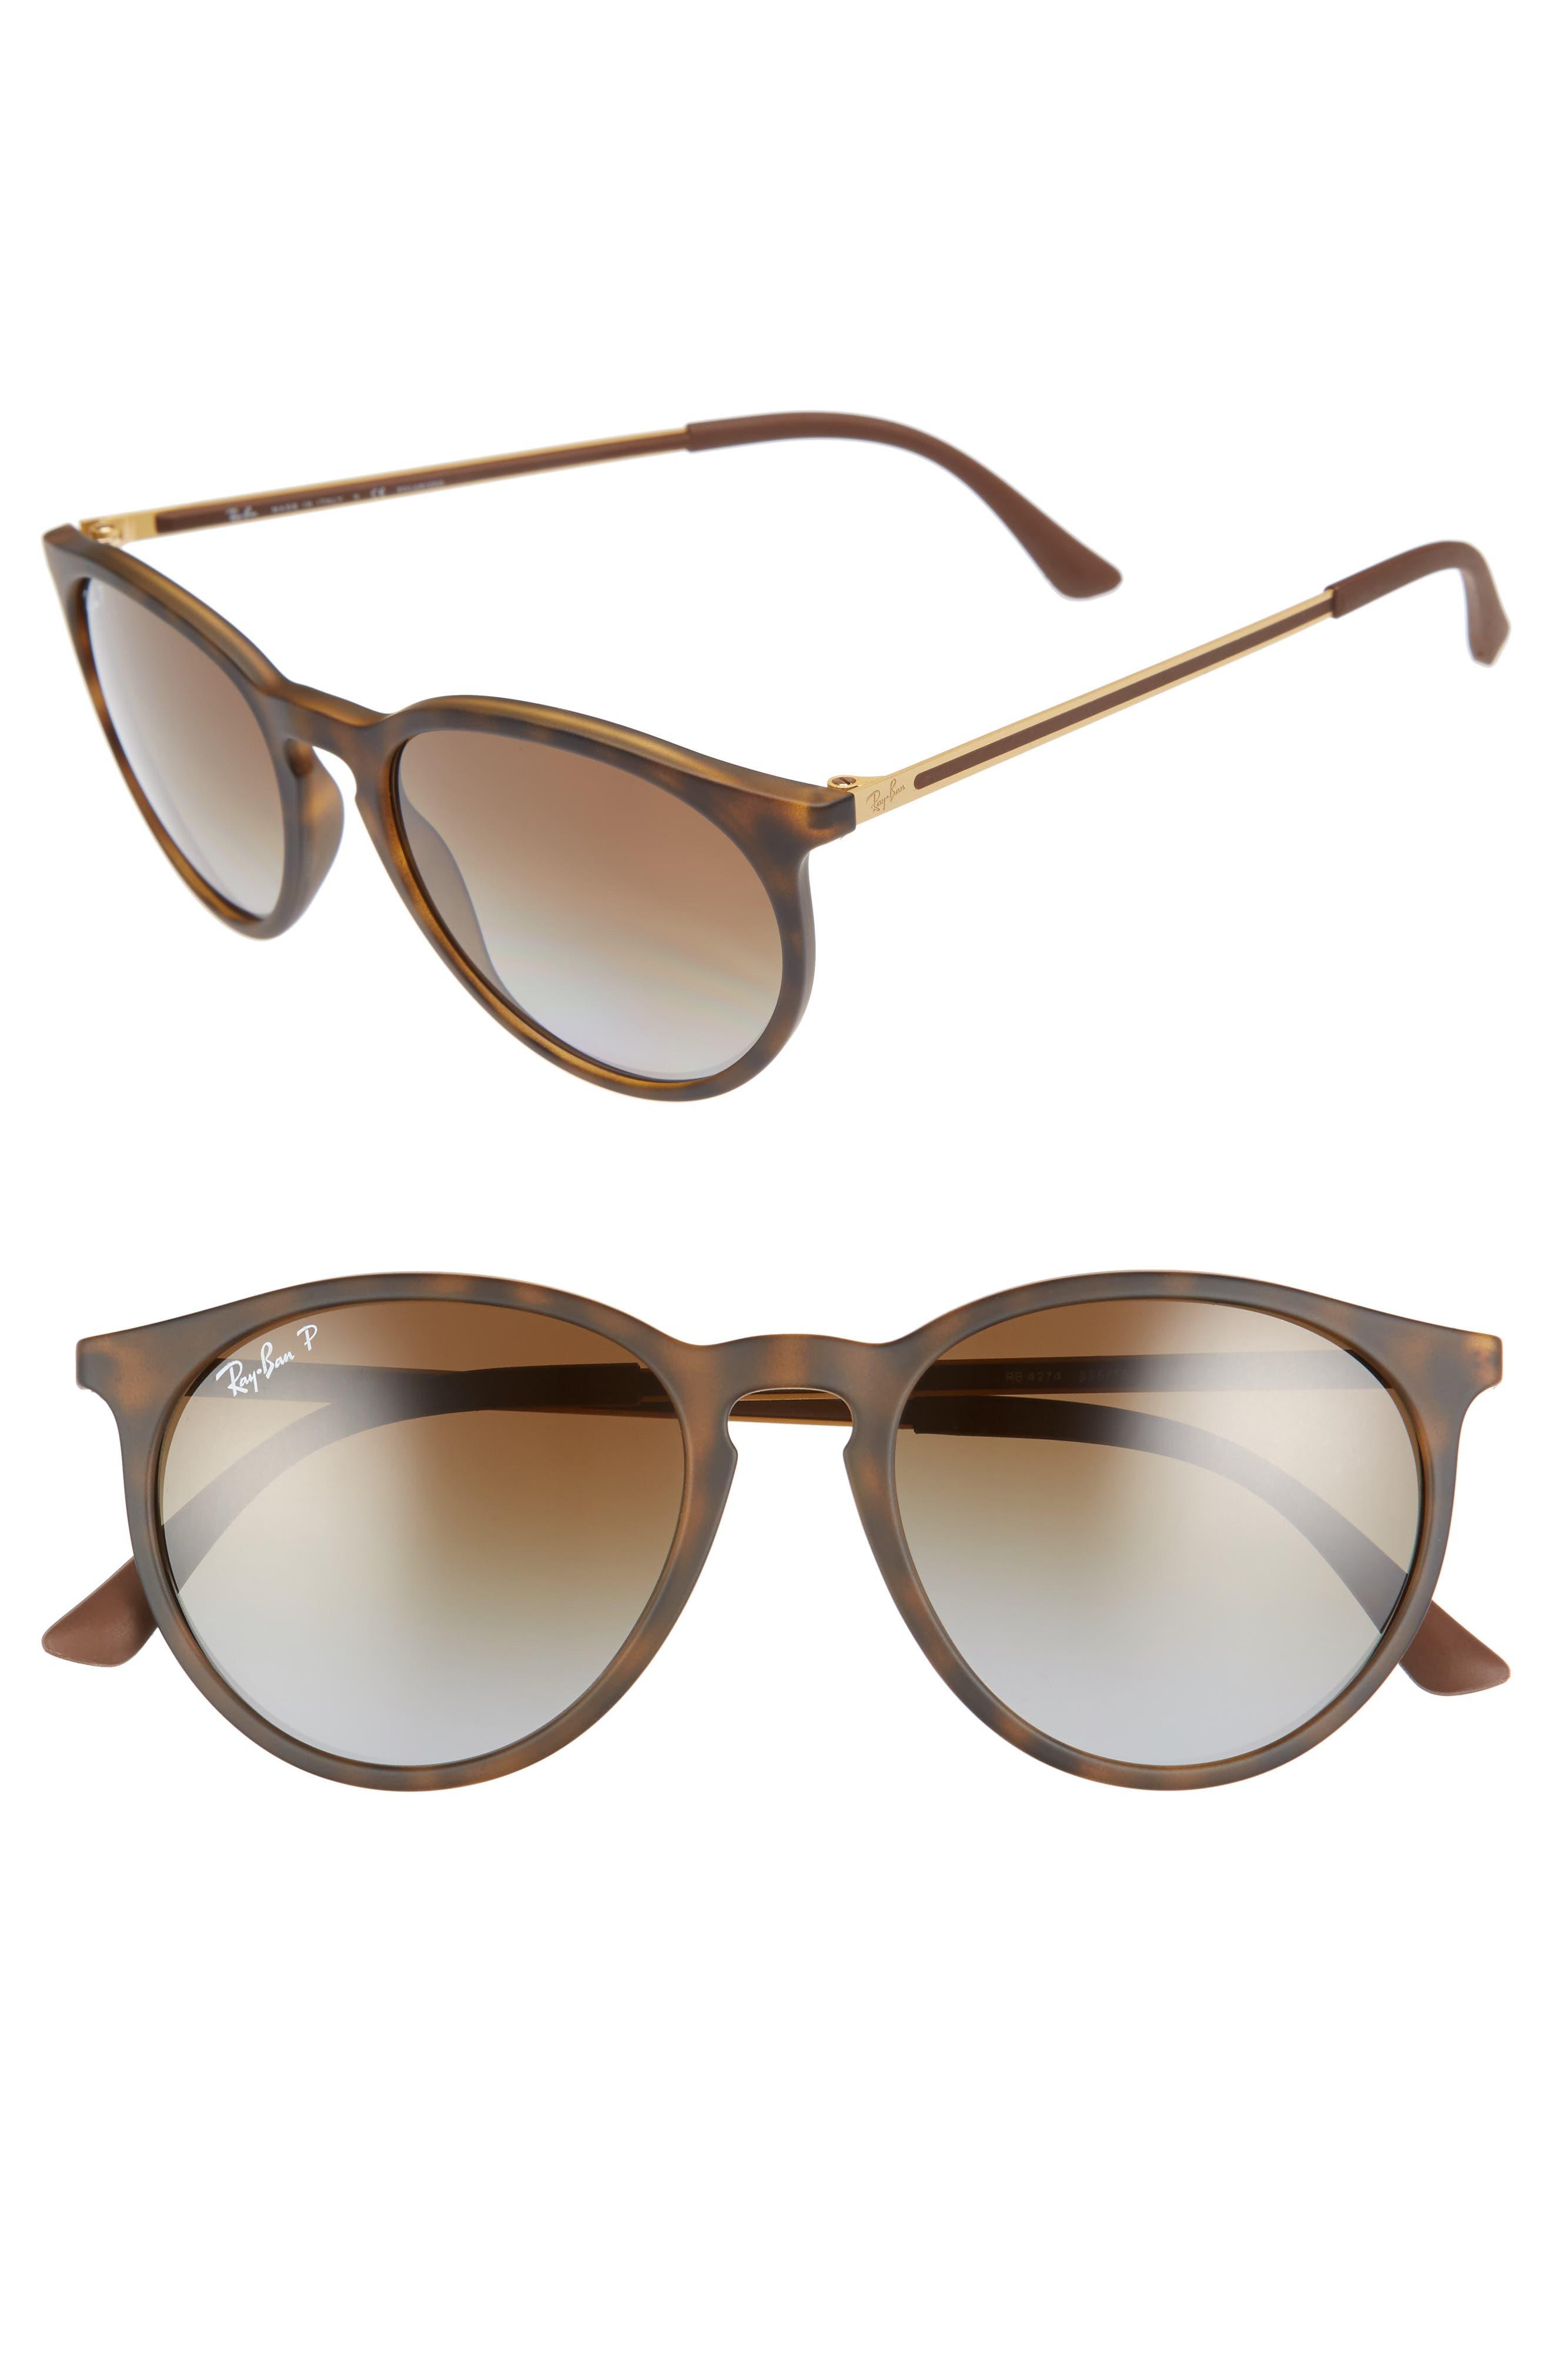 4896de5f333c6 Ray-Ban 5m Polarized Round Sunglasses -